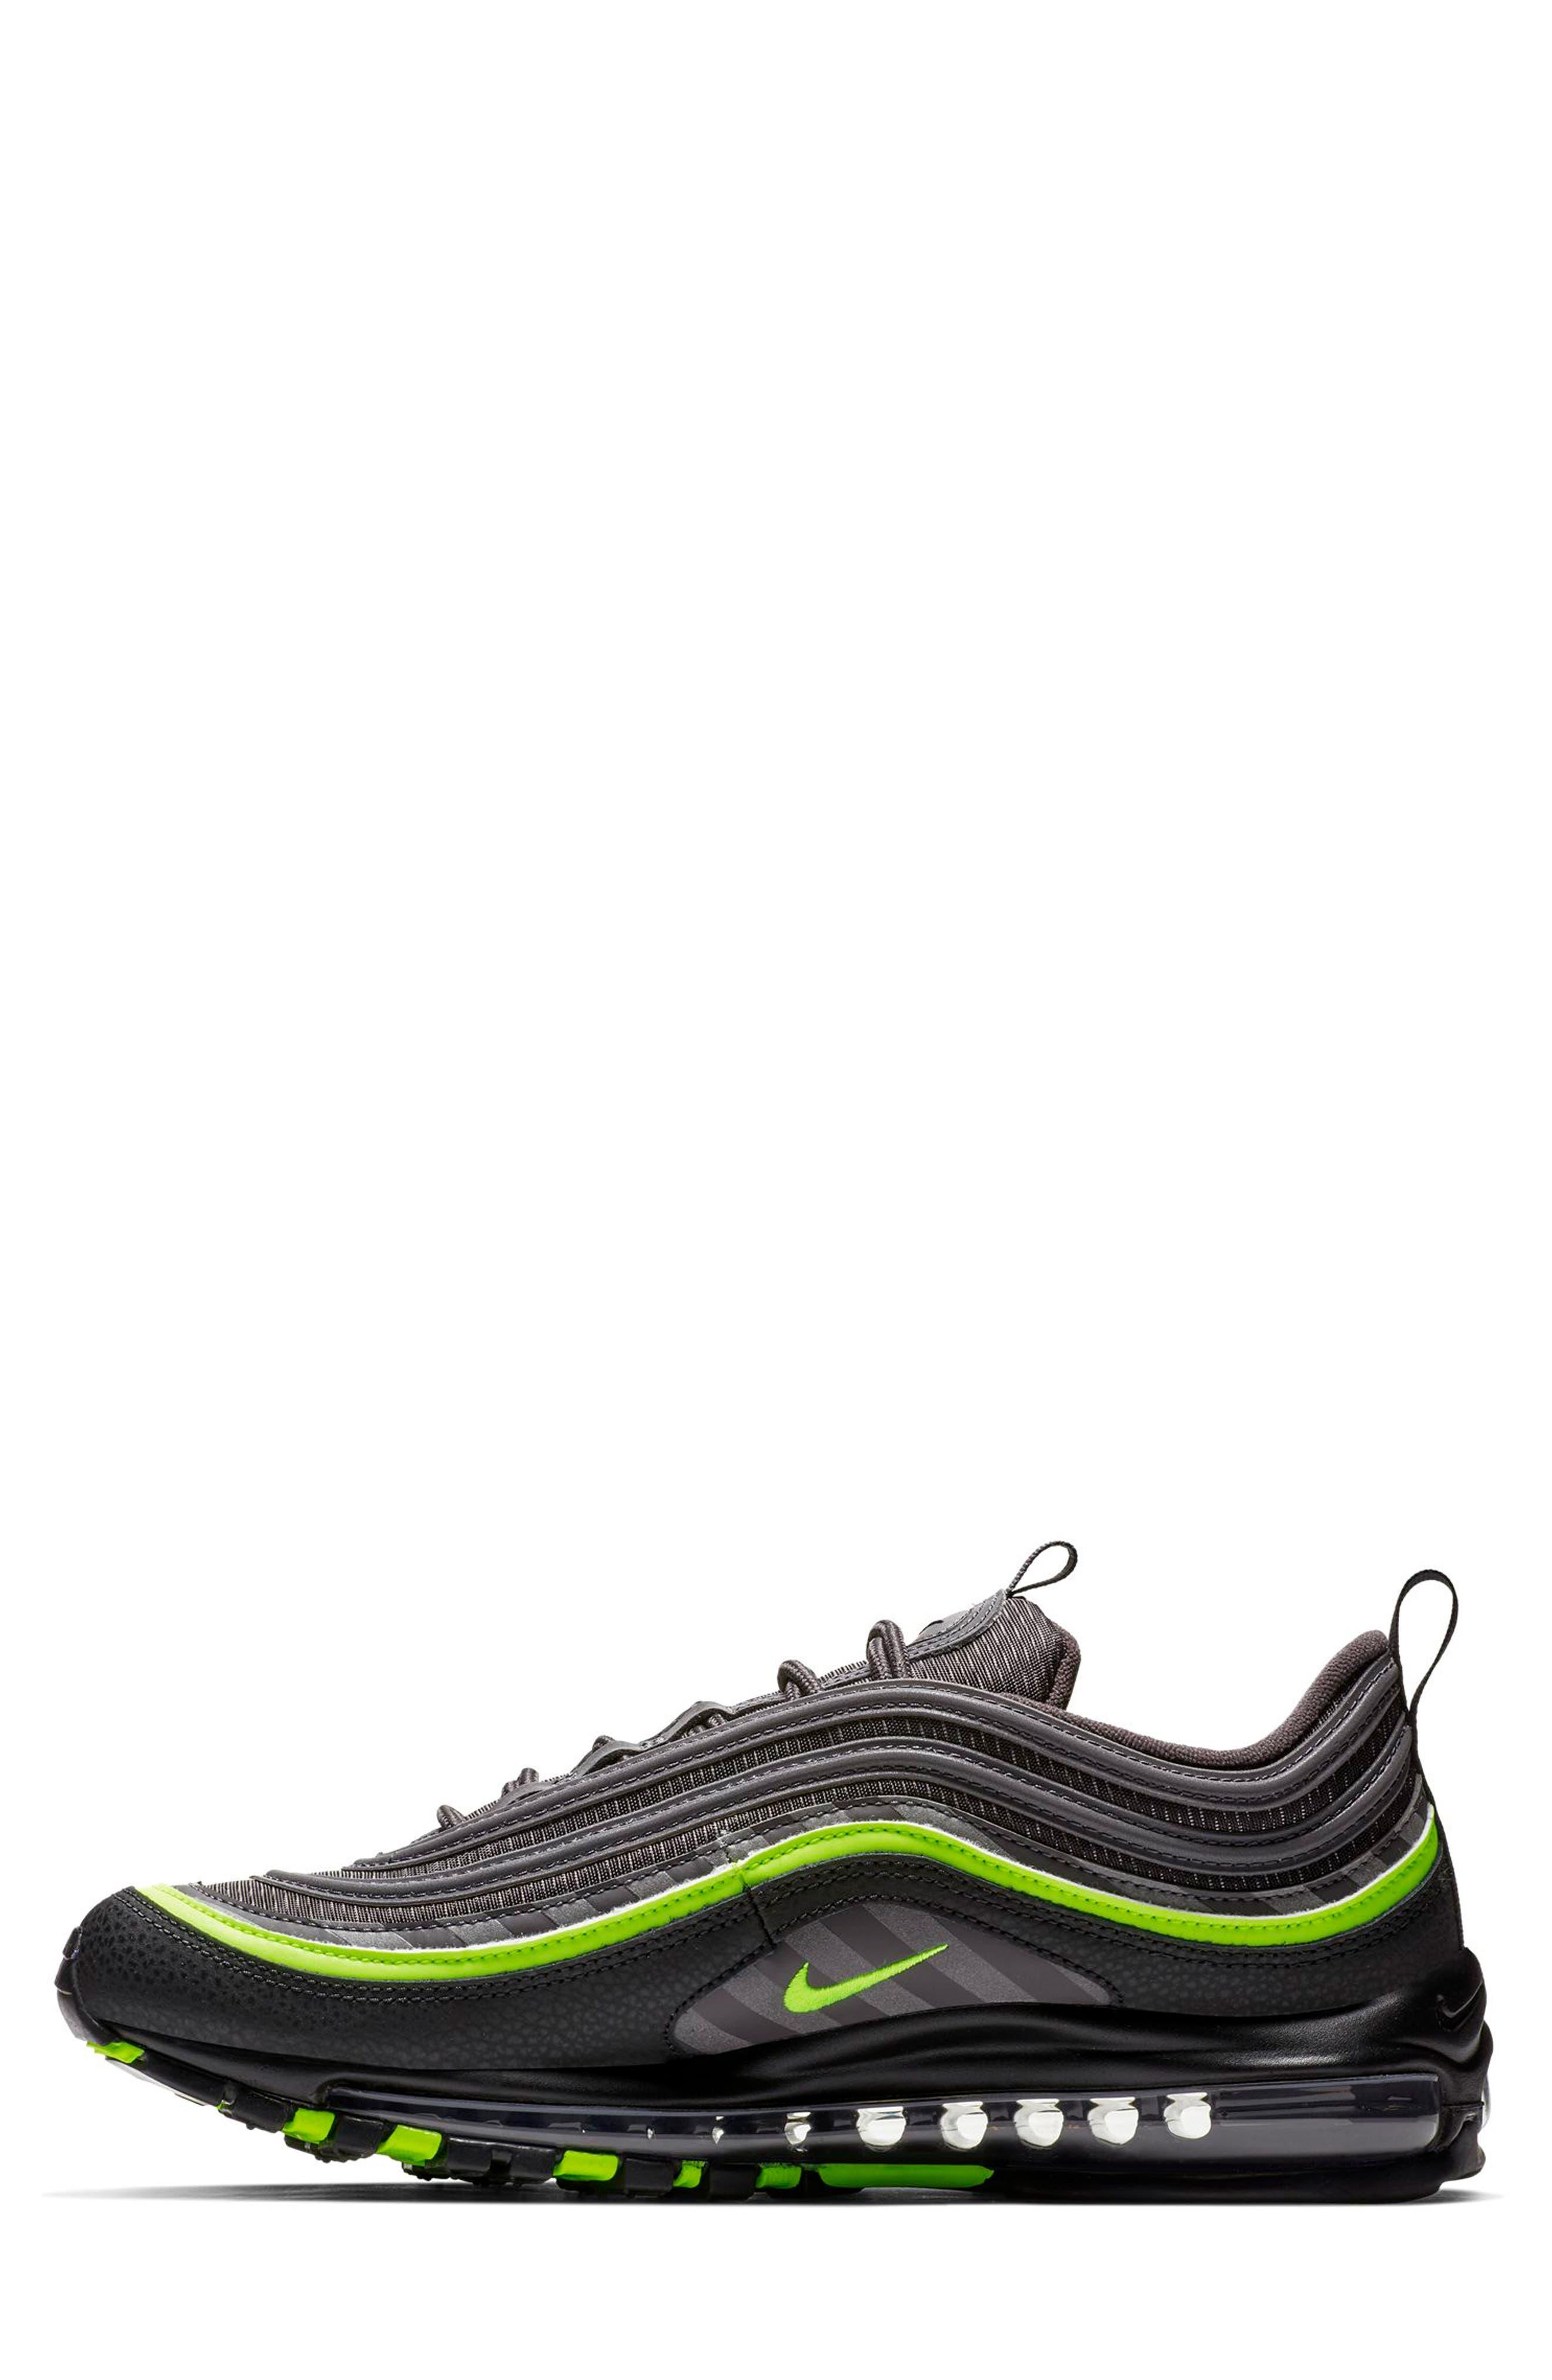 Air Max 97 Sneaker,                             Alternate thumbnail 3, color,                             THUNDER GREY/ LIME/ BLACK